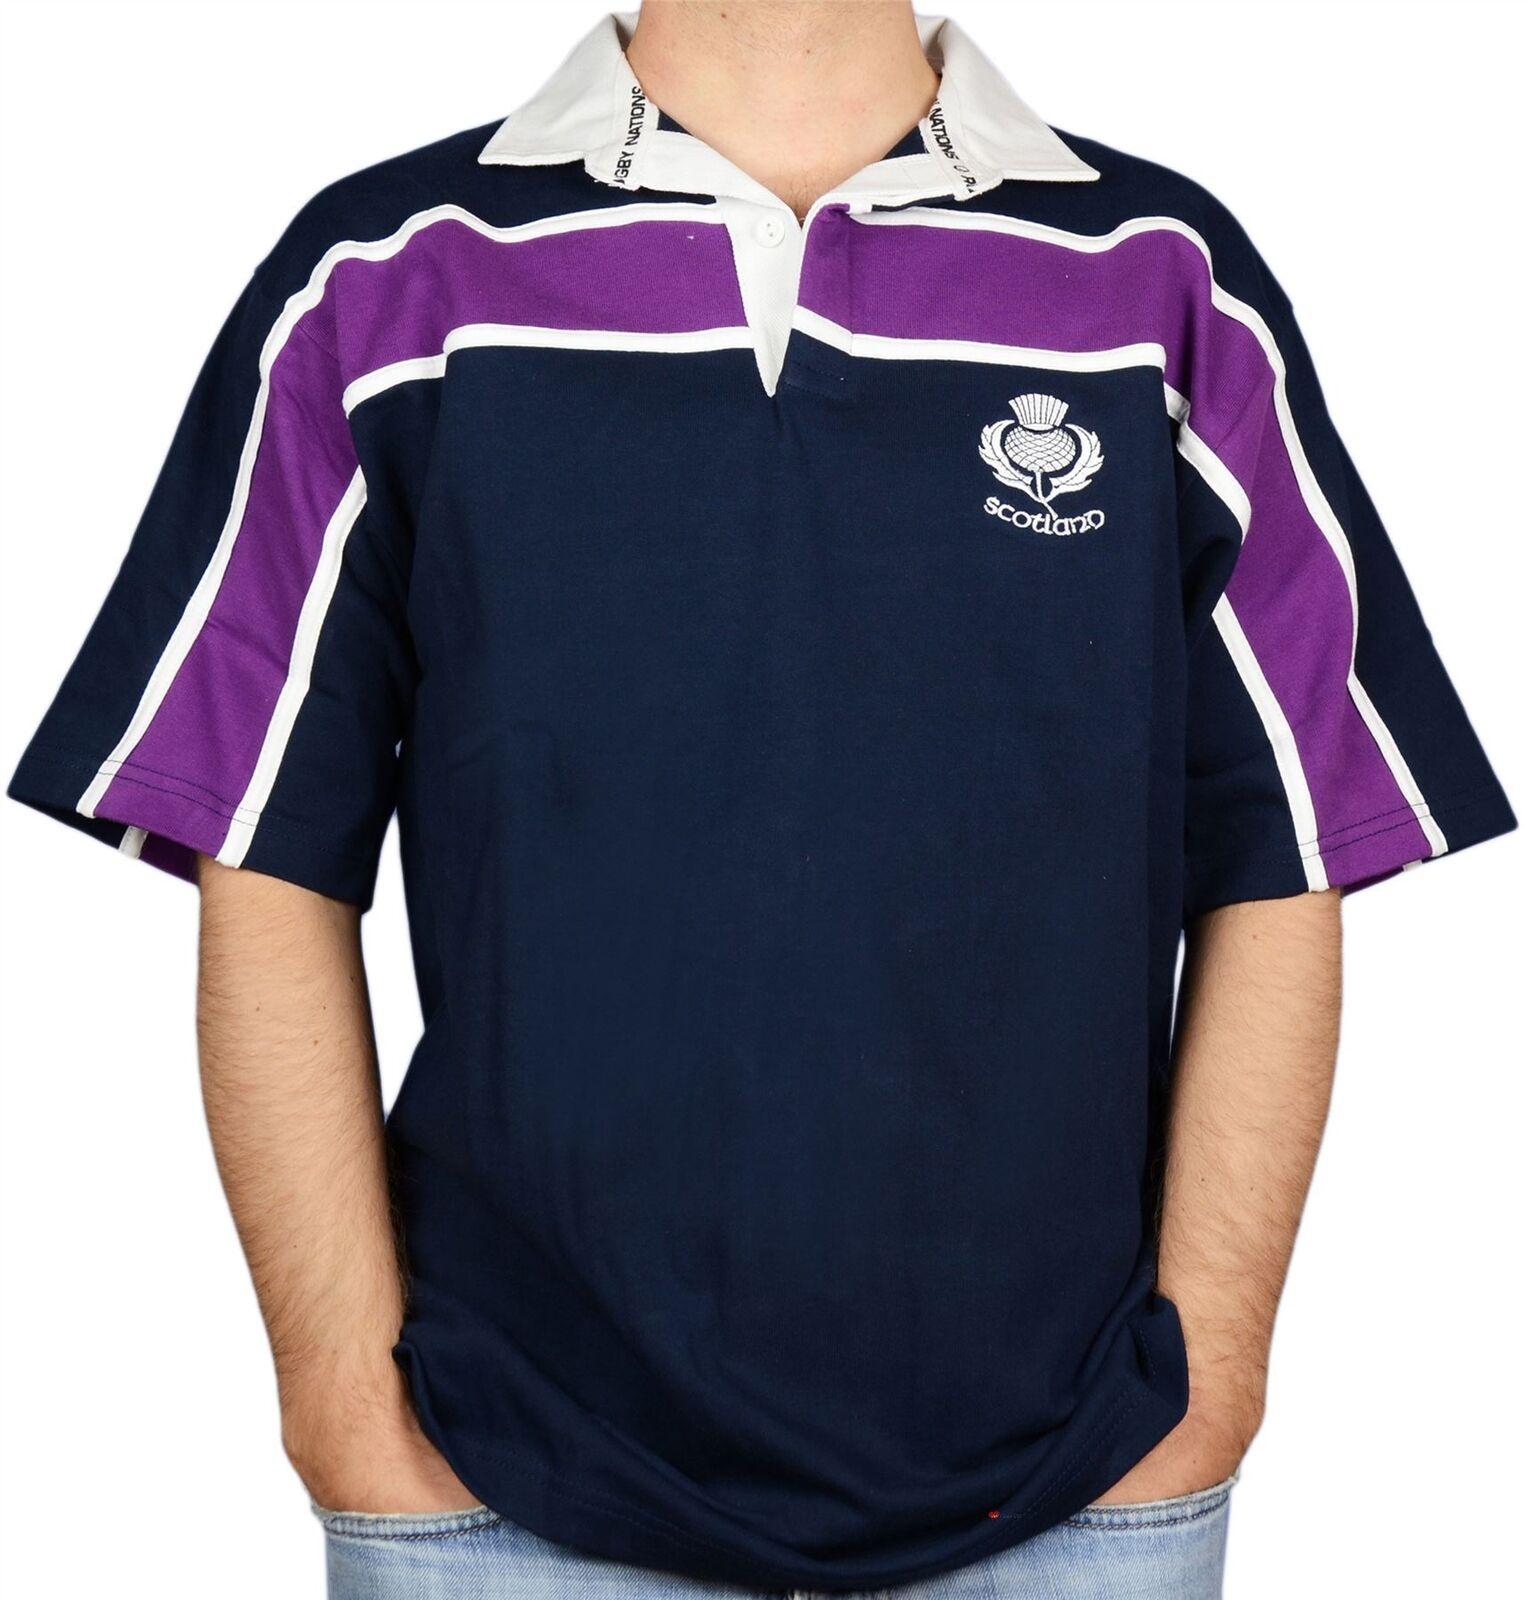 Scottish Mens Rugby Shirt Purple Stripe Thistle Logo Short Sleeve Navy X-Small